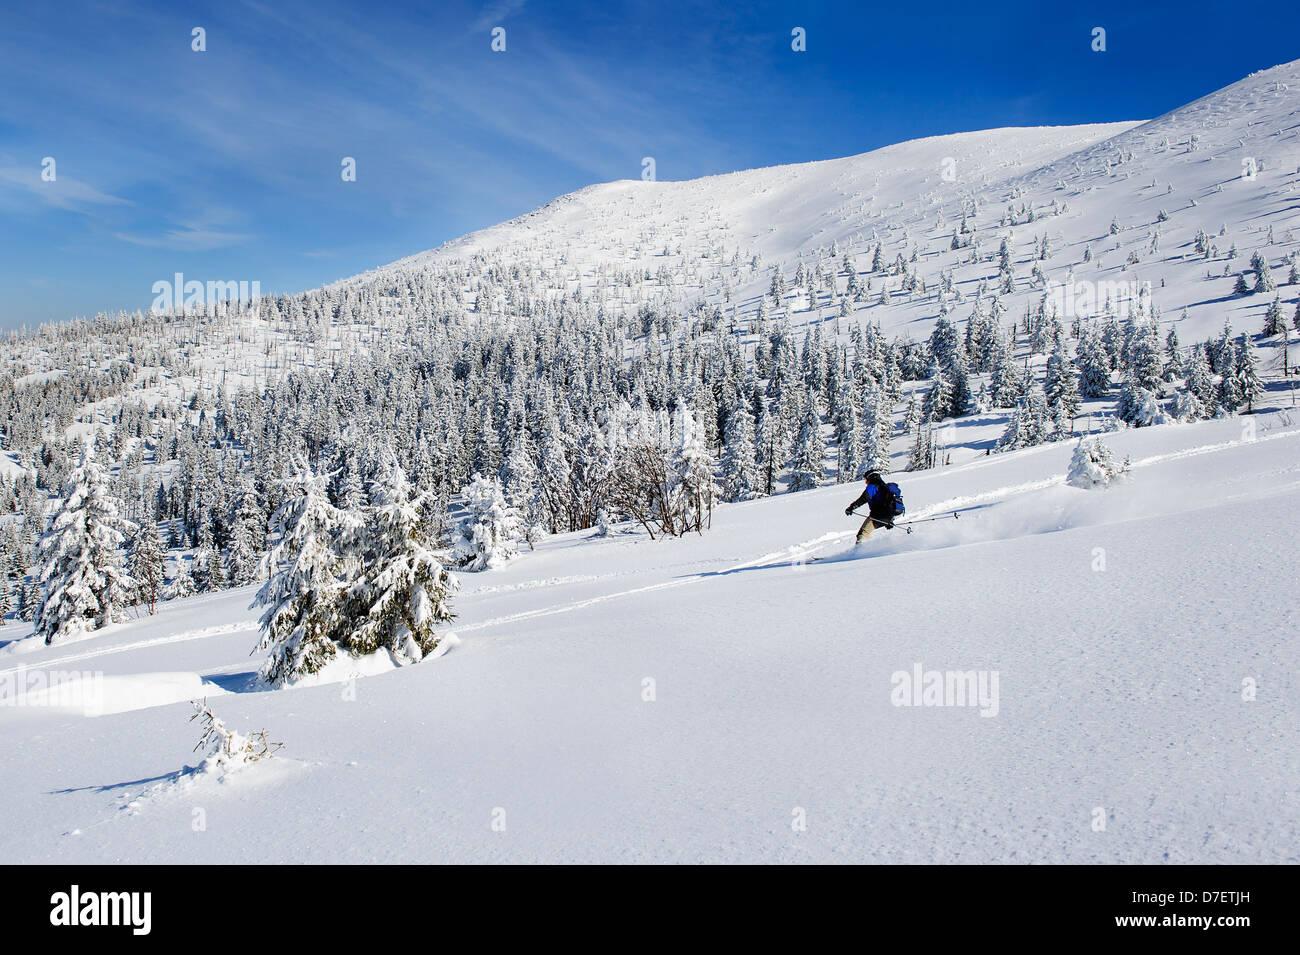 A skier downhill skiing in a winter landscape, Szklarska Poreba, Poland. - Stock Image